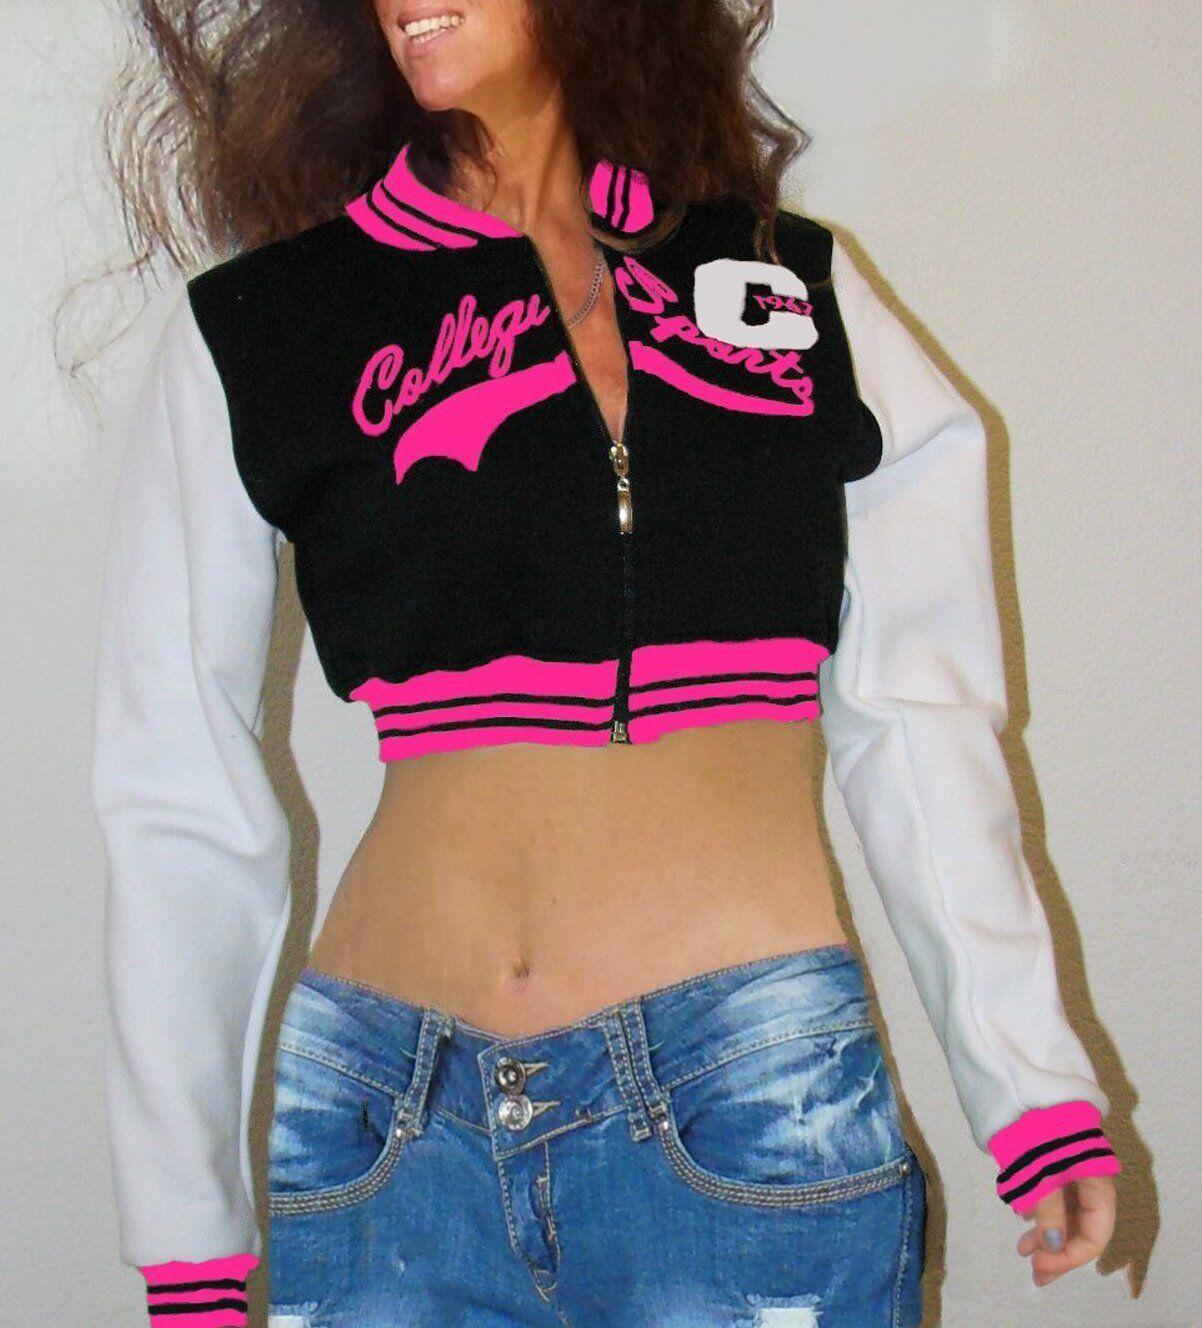 Damen College Jacke Baseball Sweat Jacke Bolero pink schwarz weiß, Gr. L, top